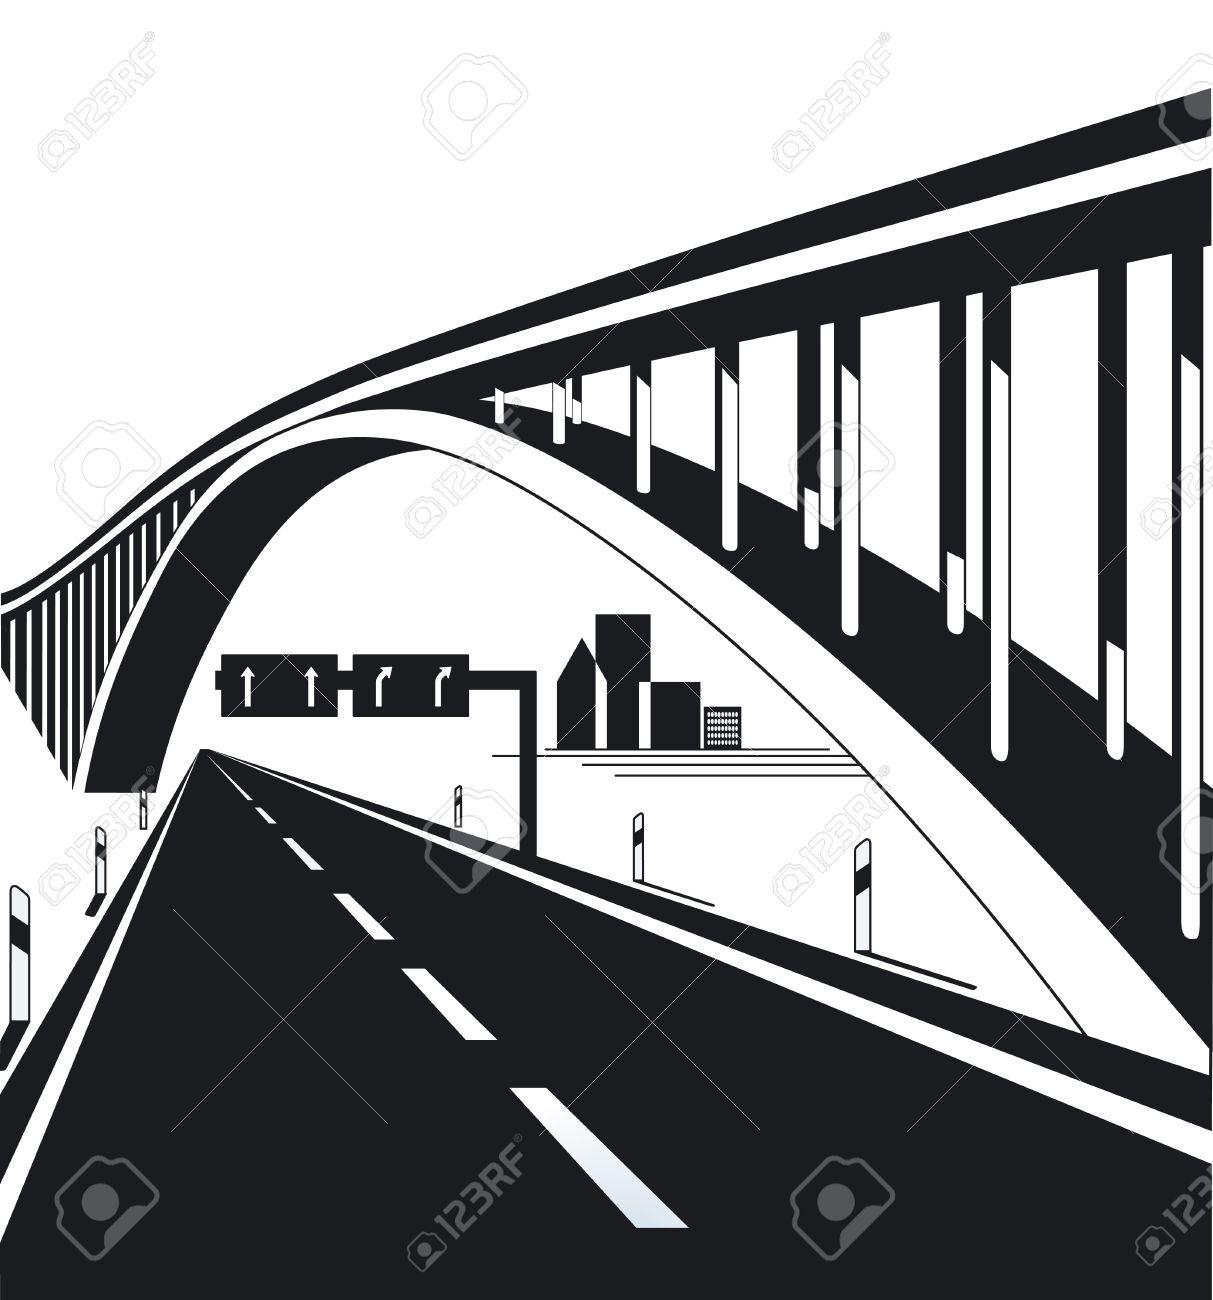 Highway Bridge Royalty Free Cliparts, Vectors, And Stock.